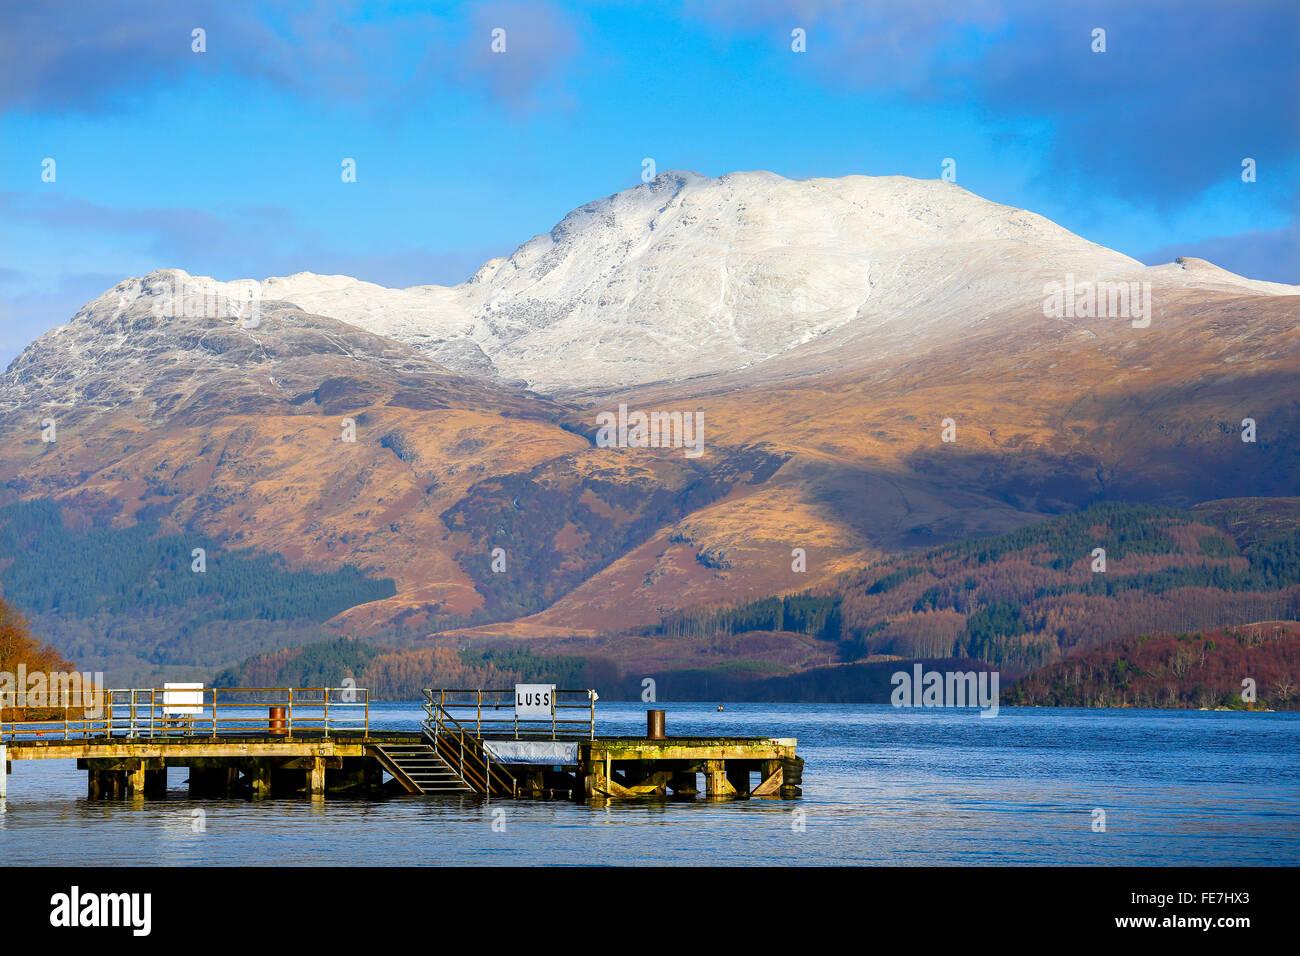 View of Ben Lomond from the Loch side at Luss village, Loch lomond, Argyll, Scotland, UK - Stock Image